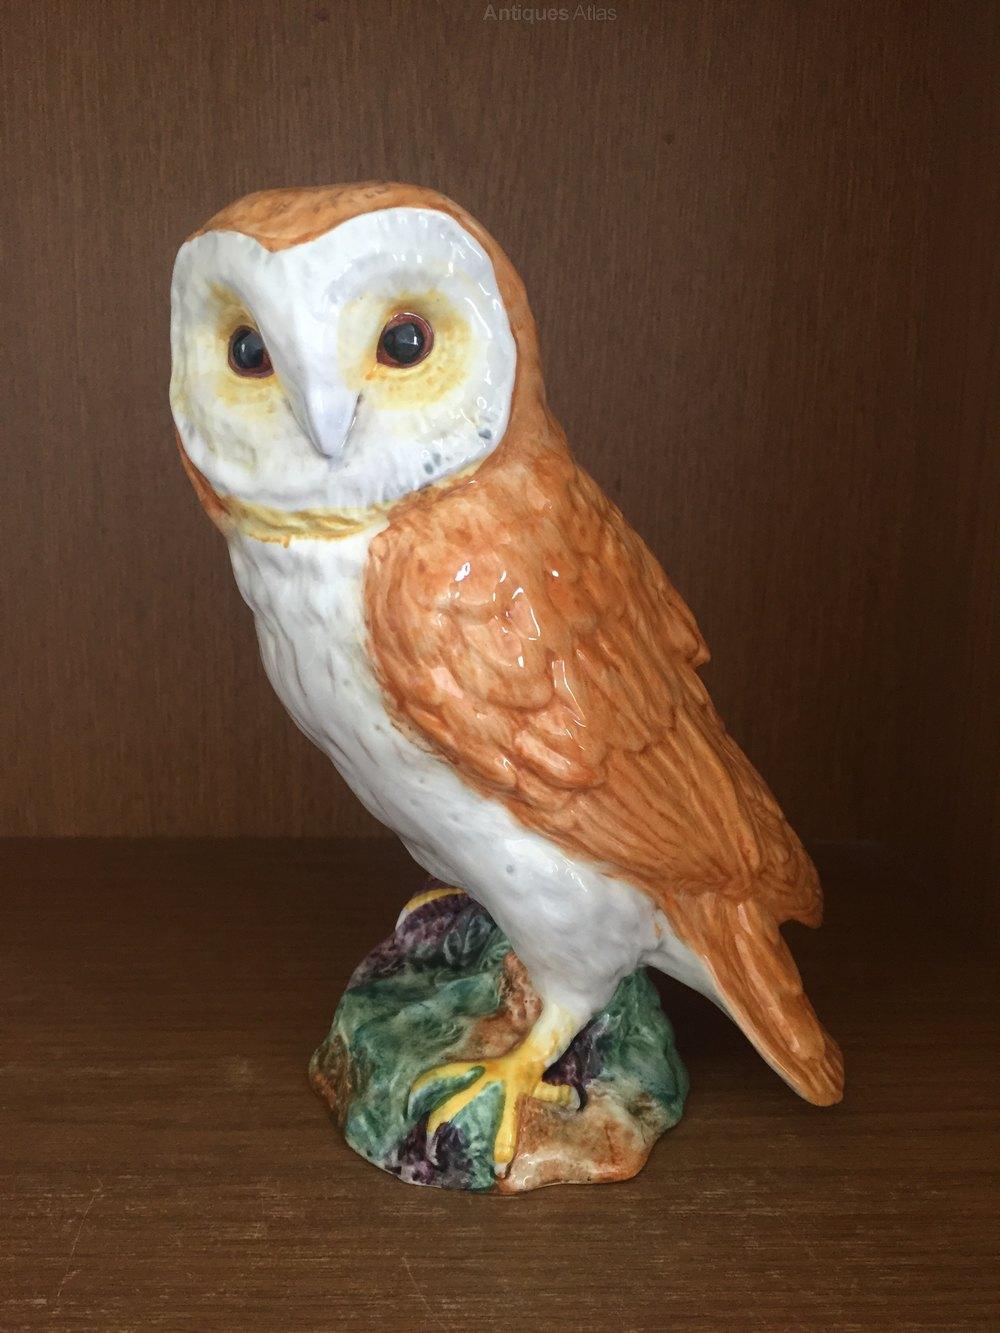 Antiques Atlas - Beswick Large Barn Owl 1046